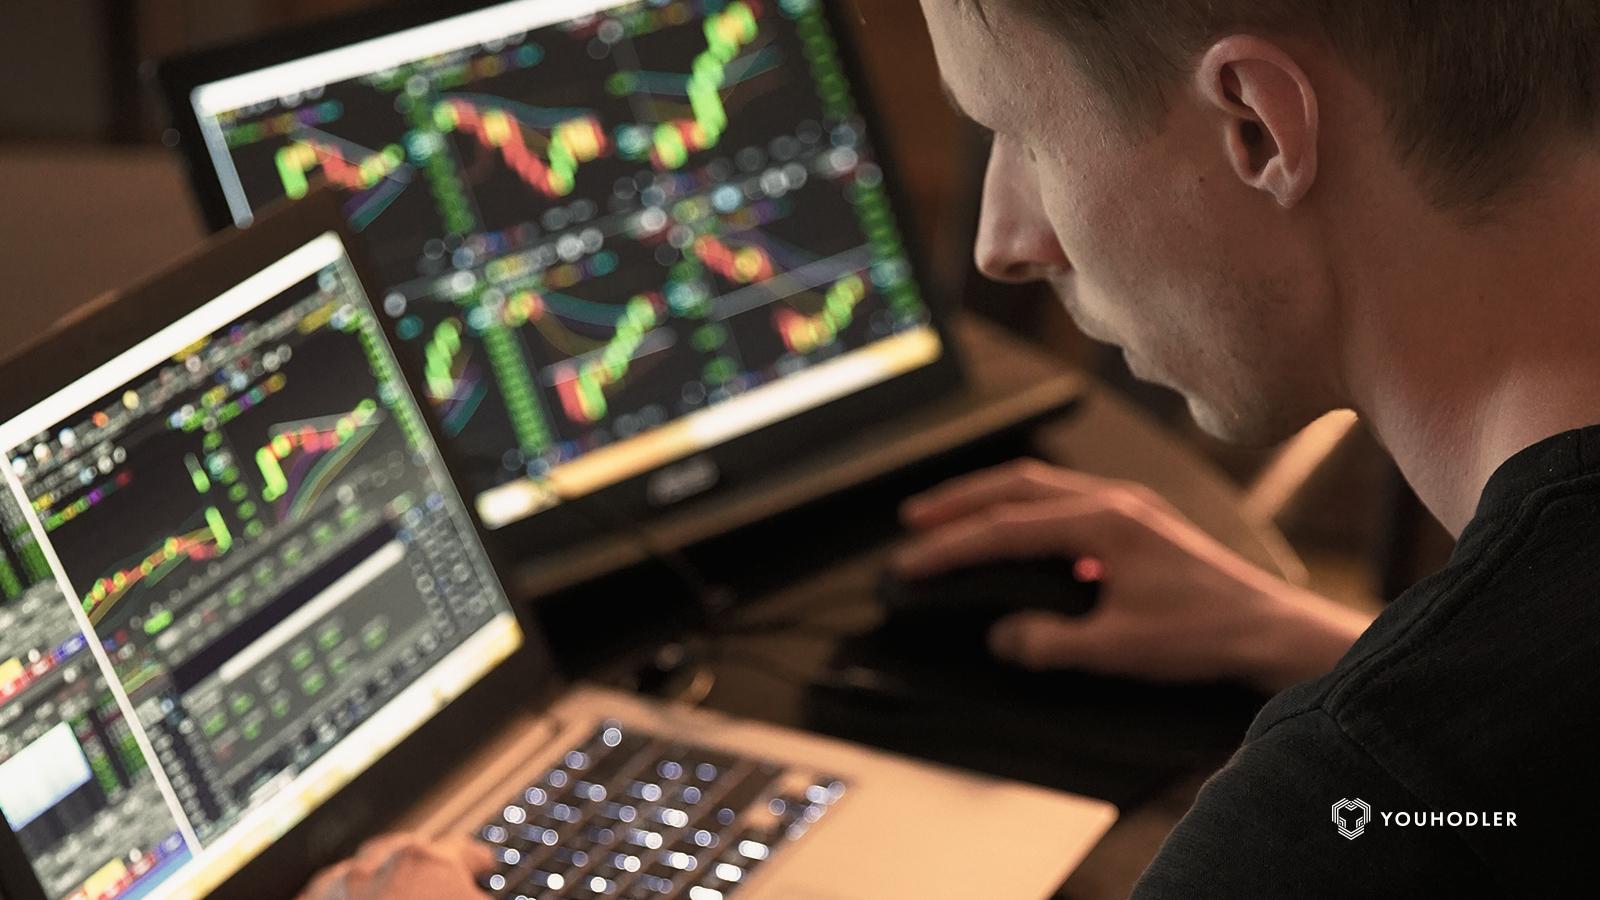 crypto traders, crypto trading, investing, bitcoin, bitcoin lending